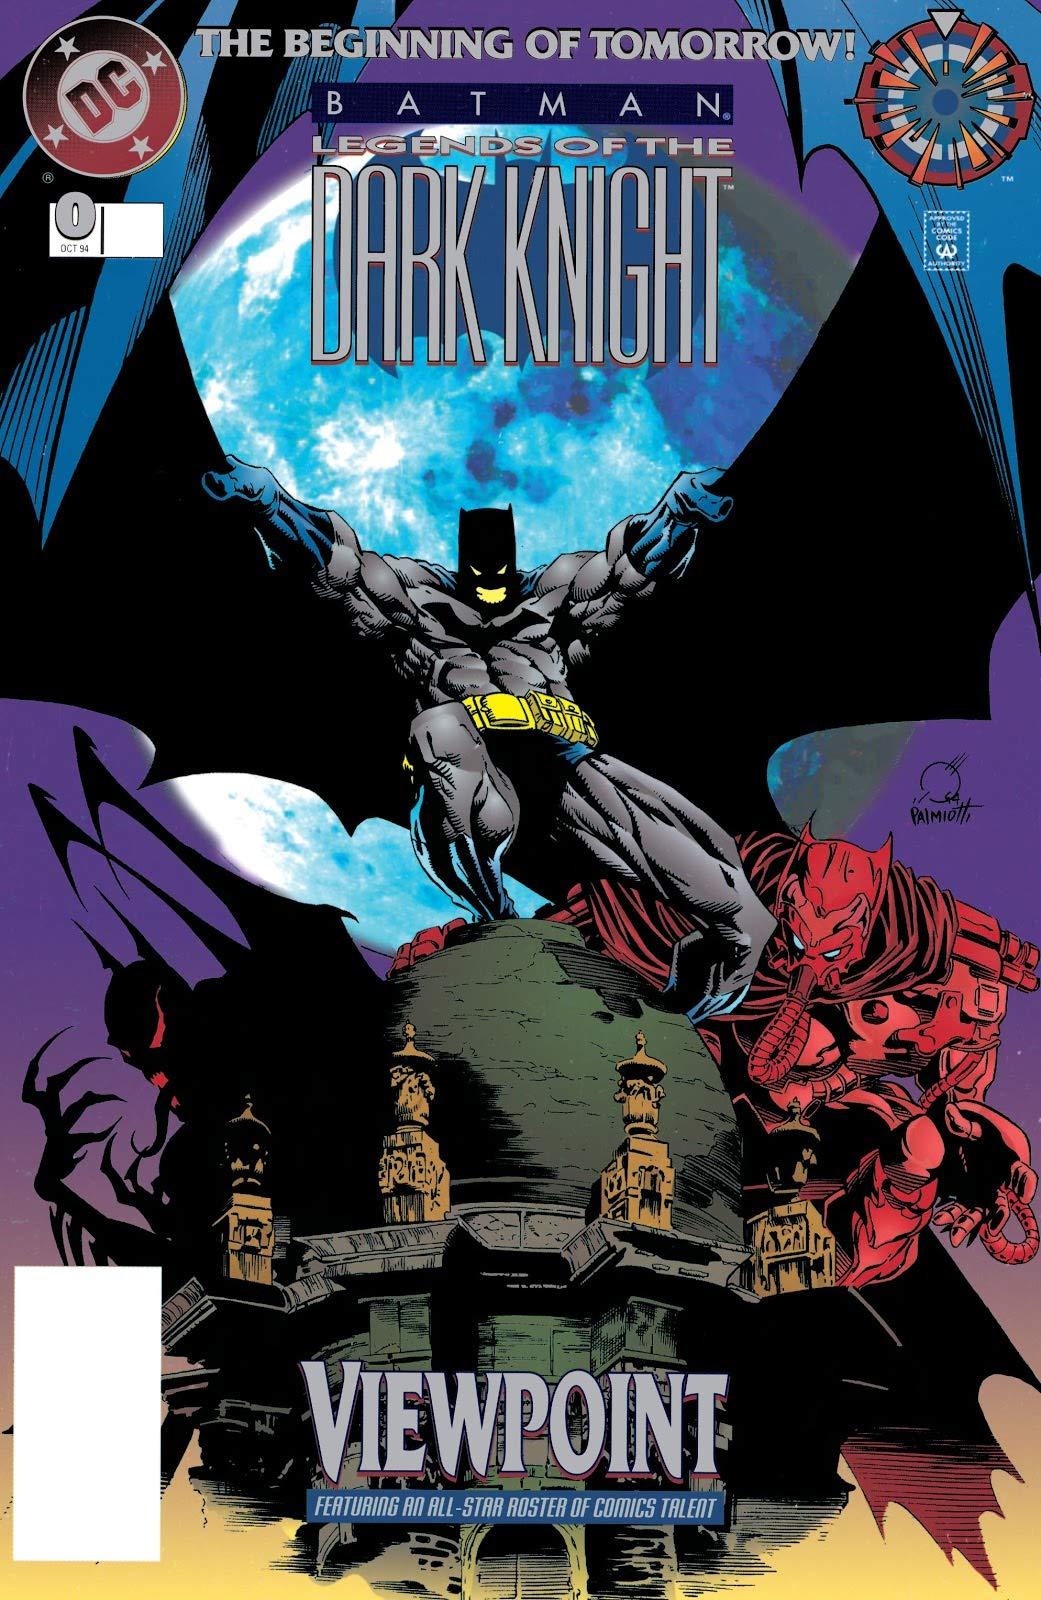 Batman Legends of the Dark Knight Chapter 1 To 28 (Part 1) DC Super Heroes Comics